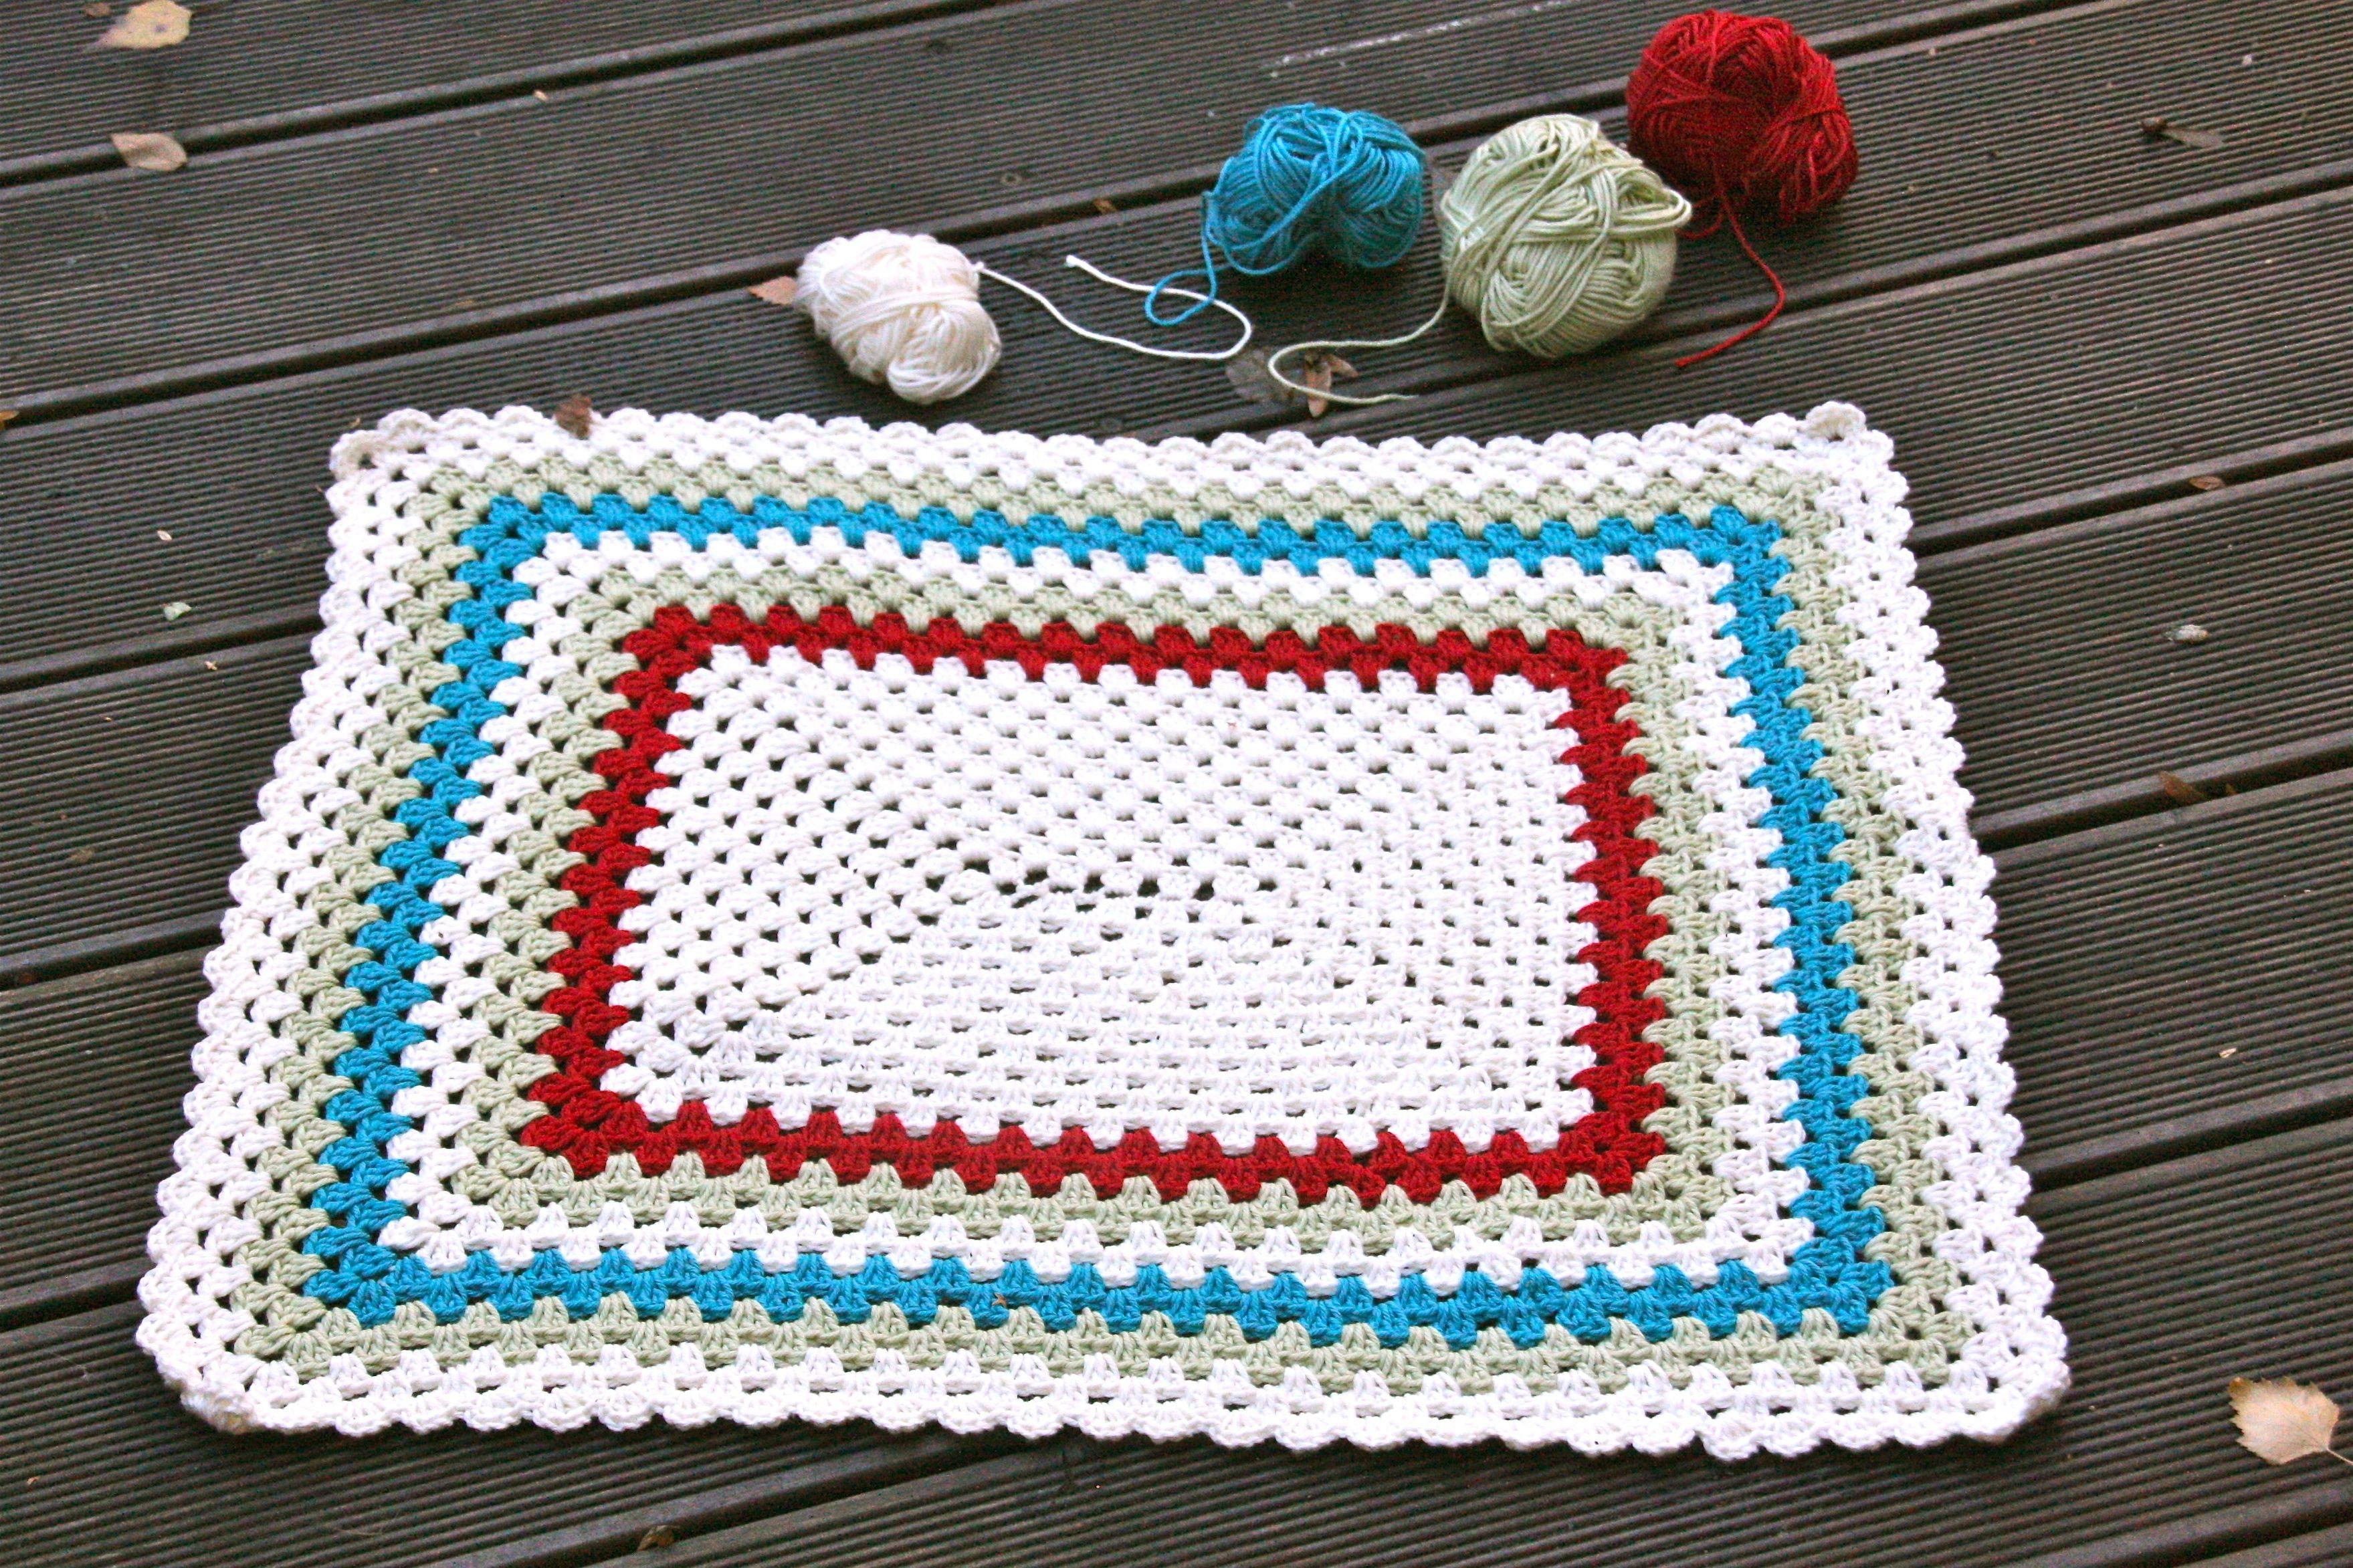 Tutorial Badematte Hakeln Stricken Pinterest Diy Crochet